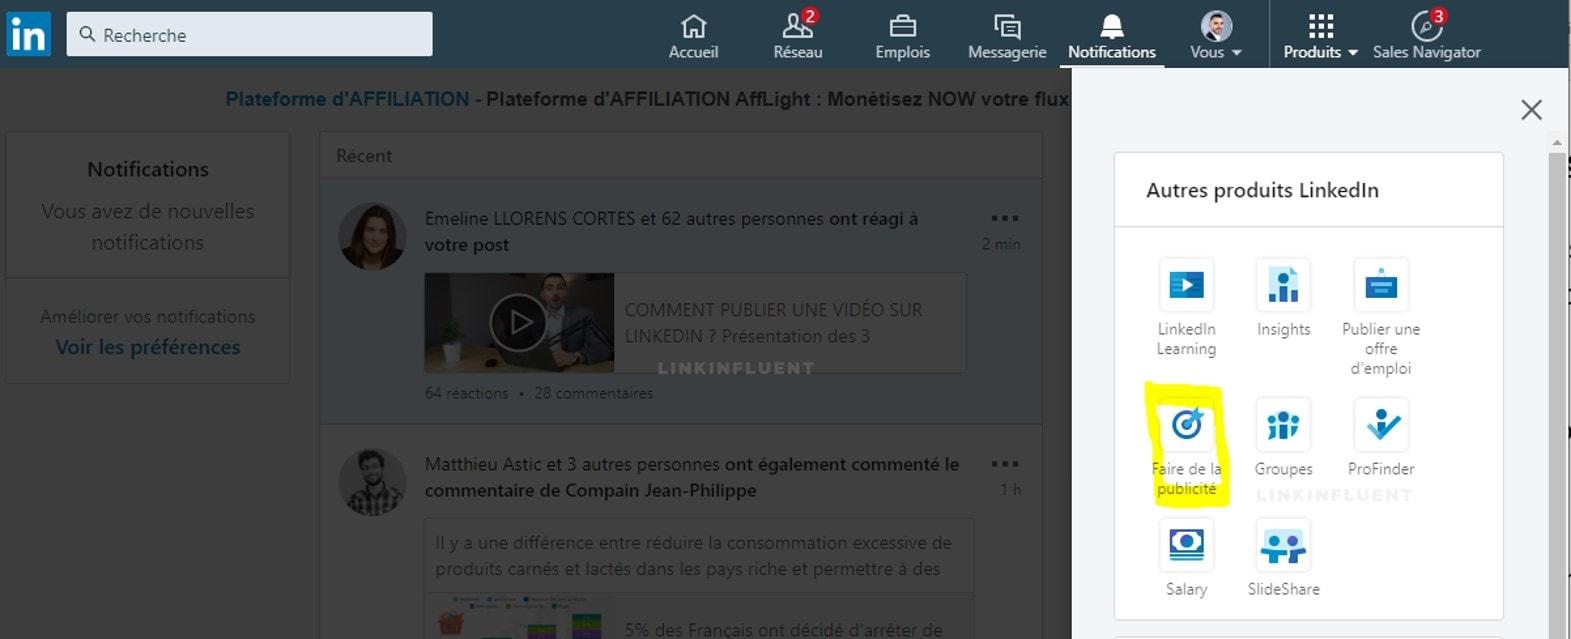 Pixel LinkedIn et LinkedIn insight tag - Tutoriel LinkedIn en français - Proinfluent